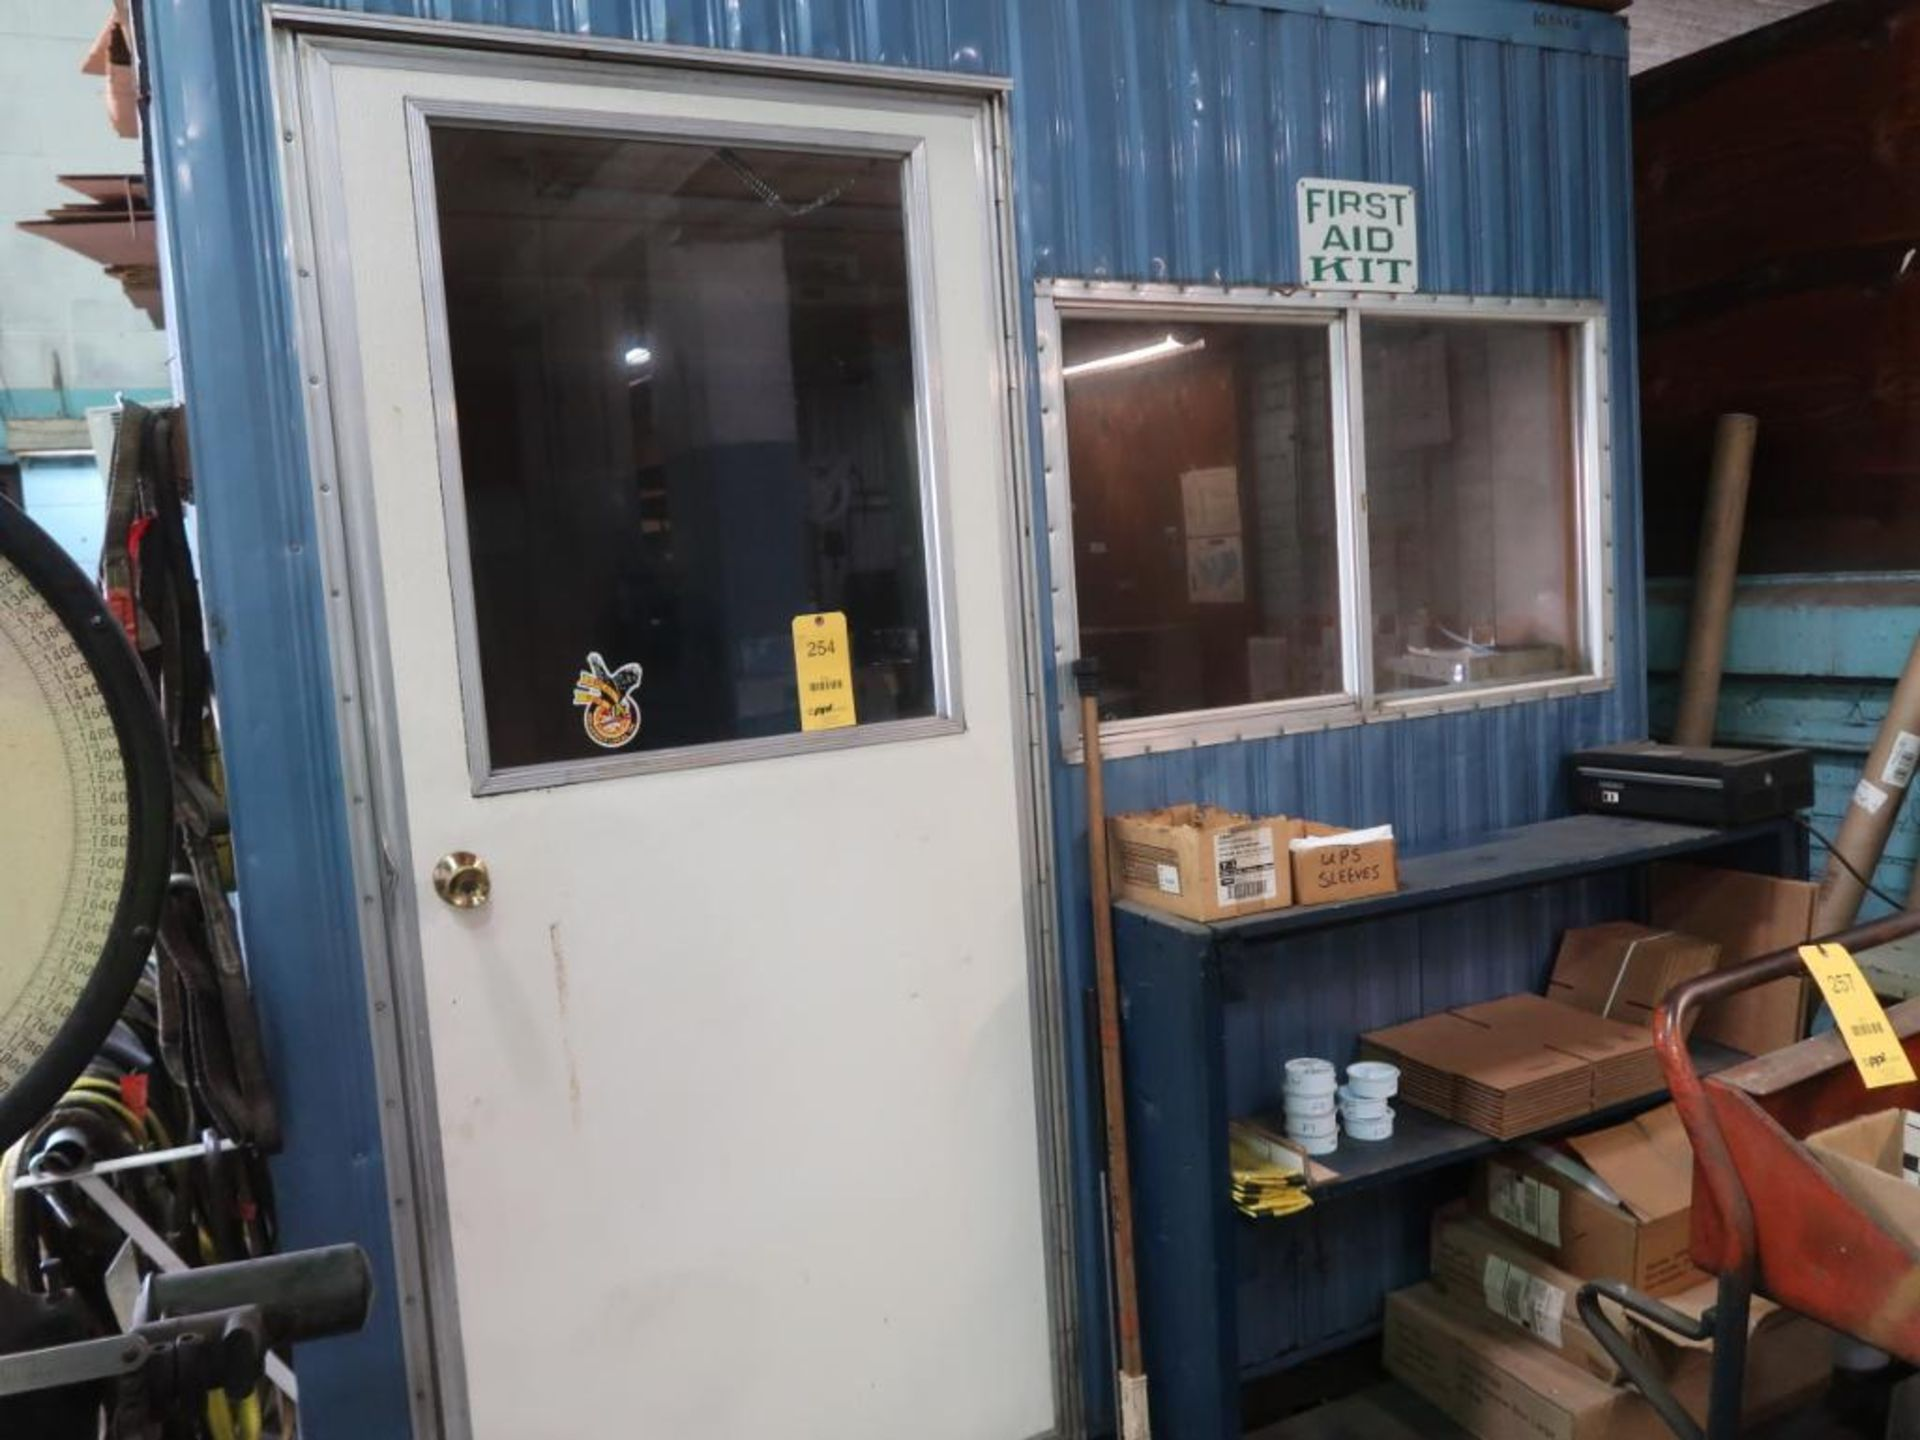 Lot 254 - 8 ft. x 12 ft. (est.) Forkliftable Portable Office